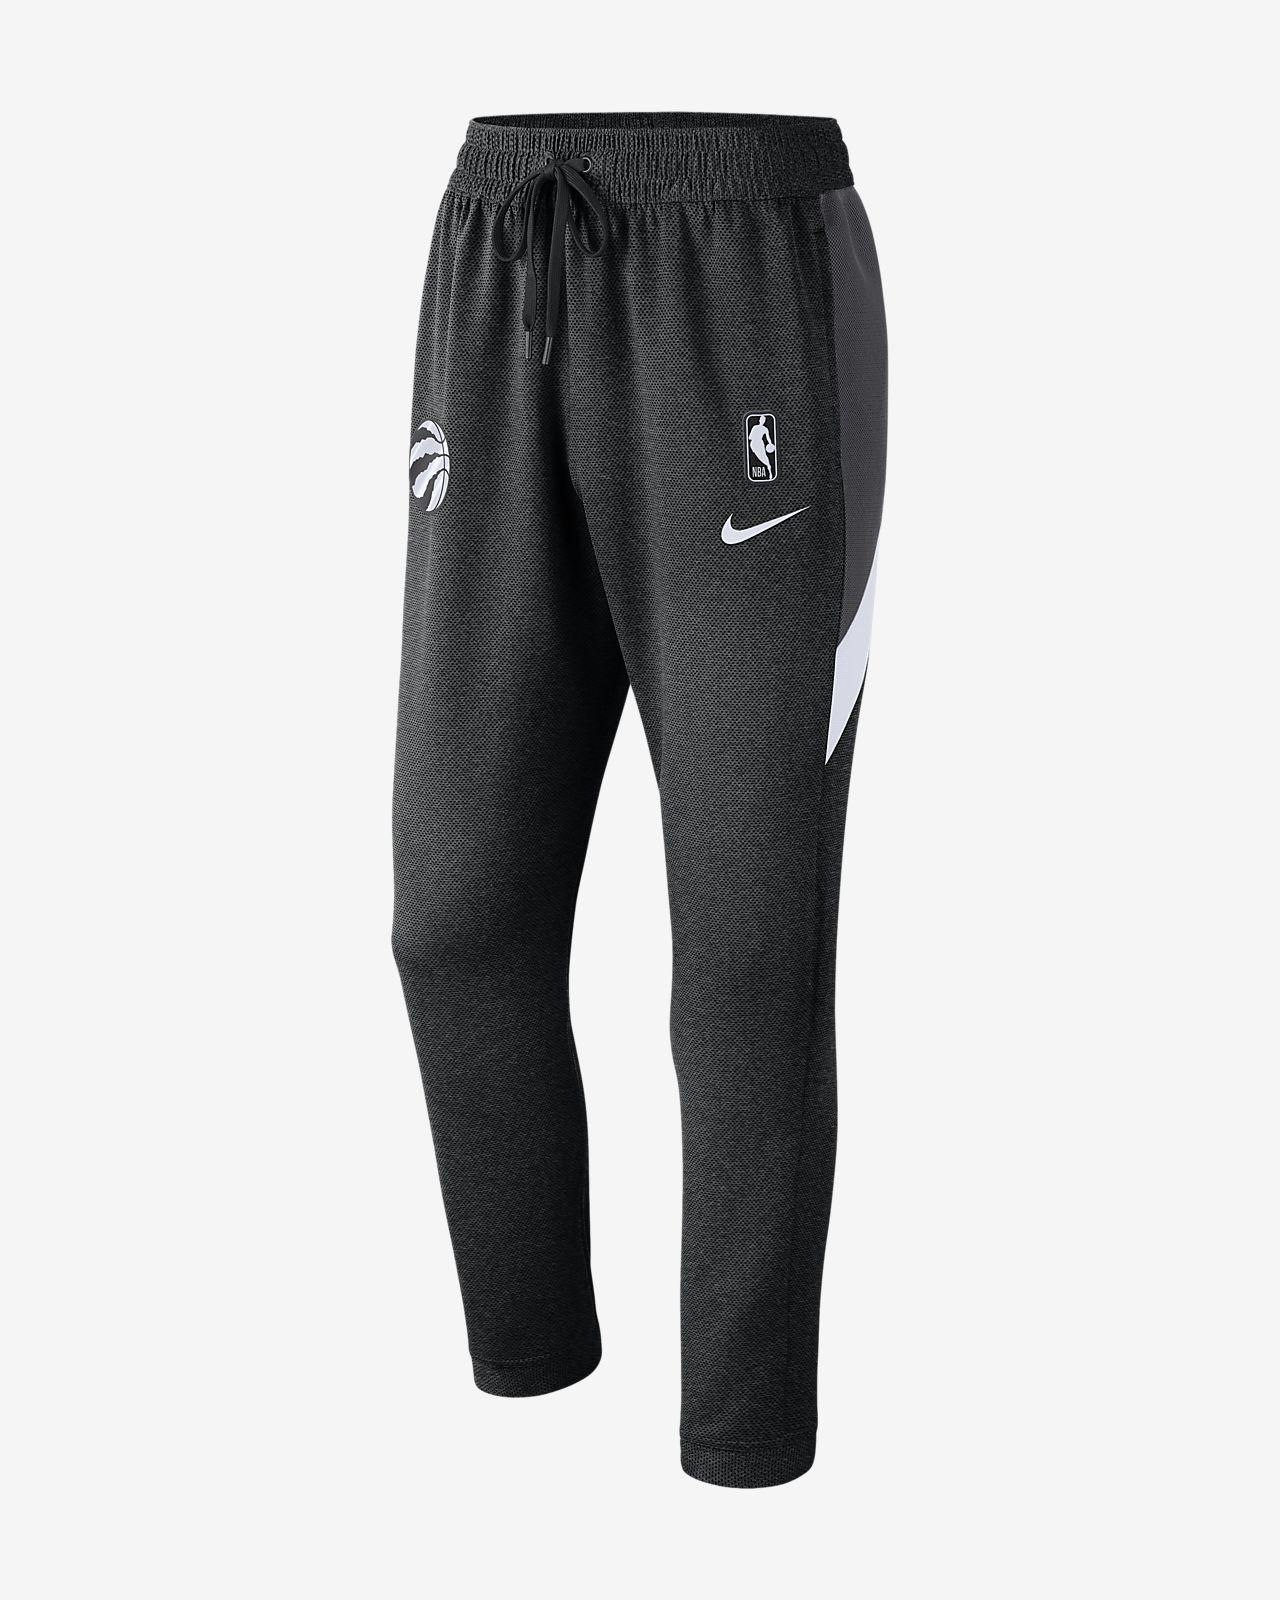 Мужские брюки НБА Toronto Raptors Nike Therma Flex Showtime